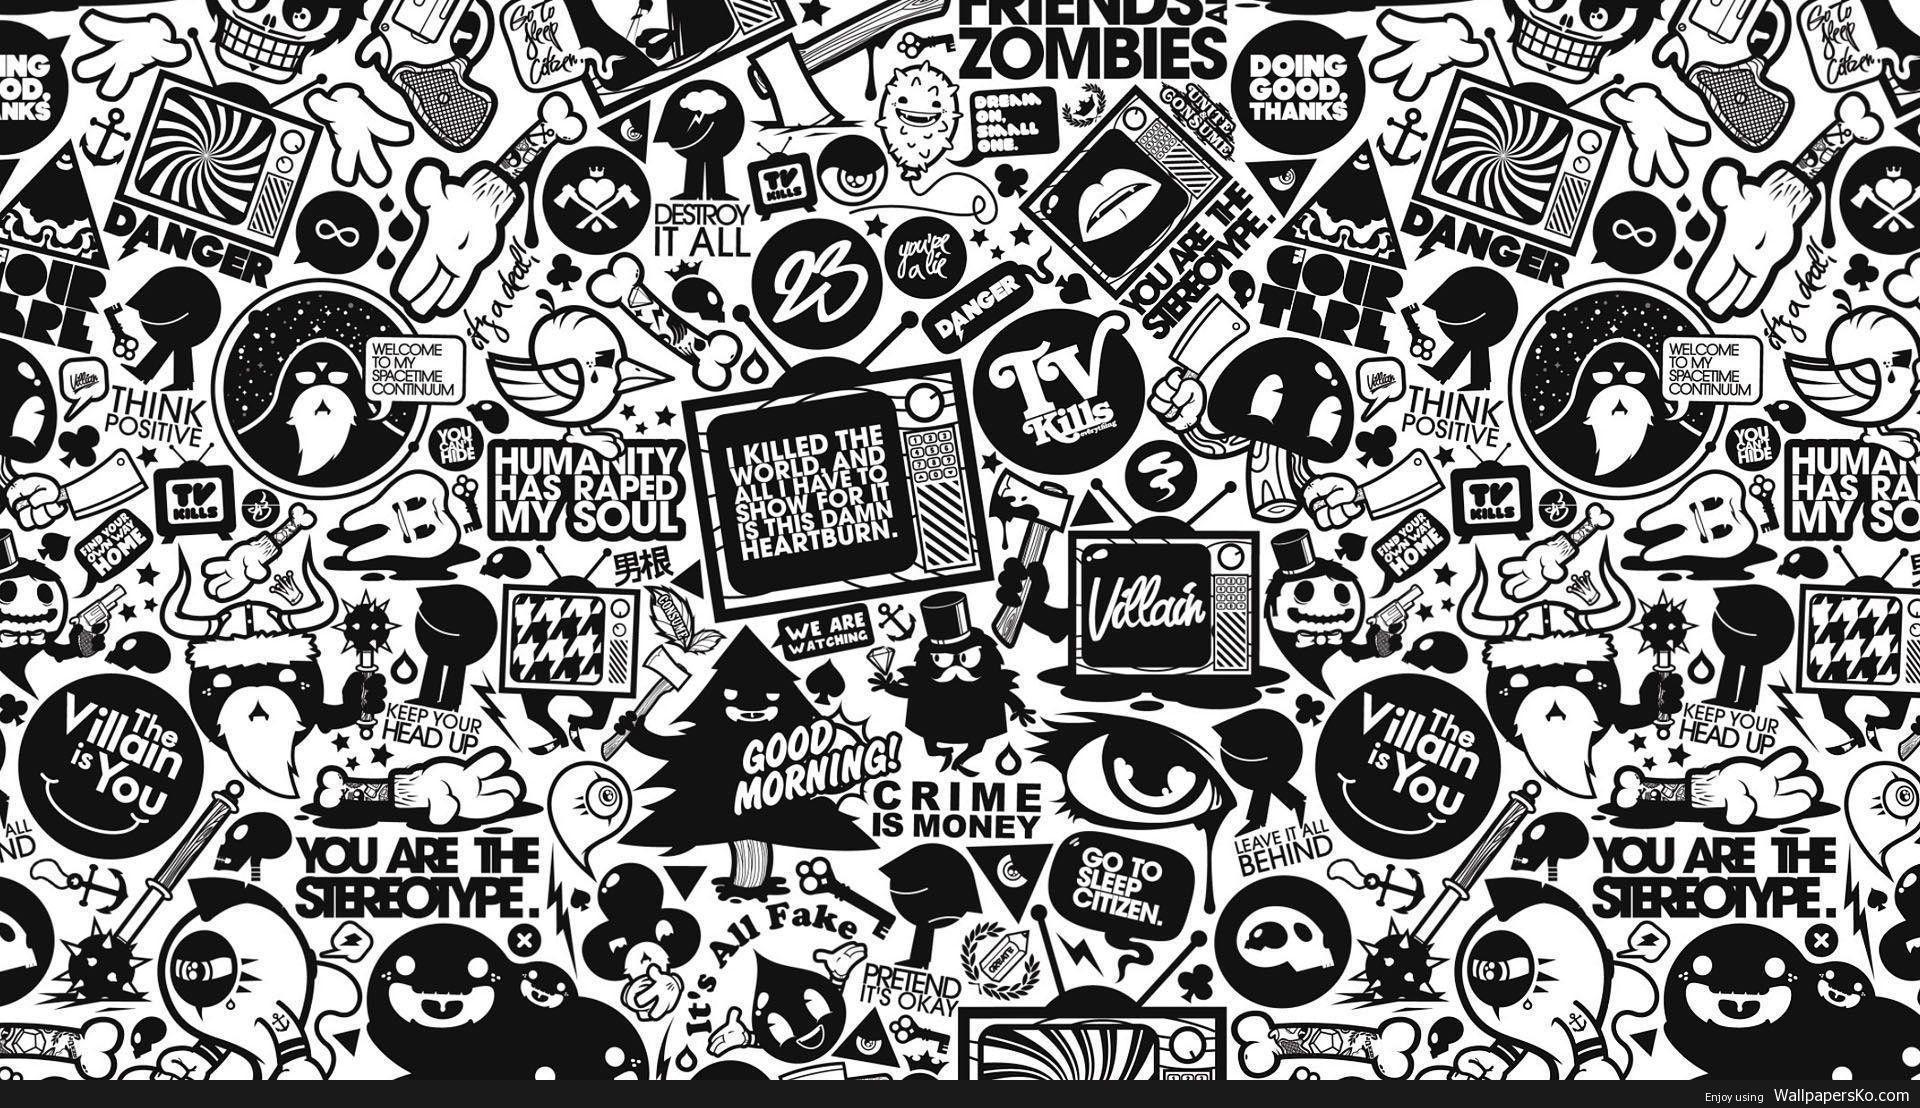 Wallpaper For Mac Http Wallpapersko Com Wallpaper For Mac Html Hd Wallpapers Download Mac Wallpaper Doodle Art Retro Wallpaper